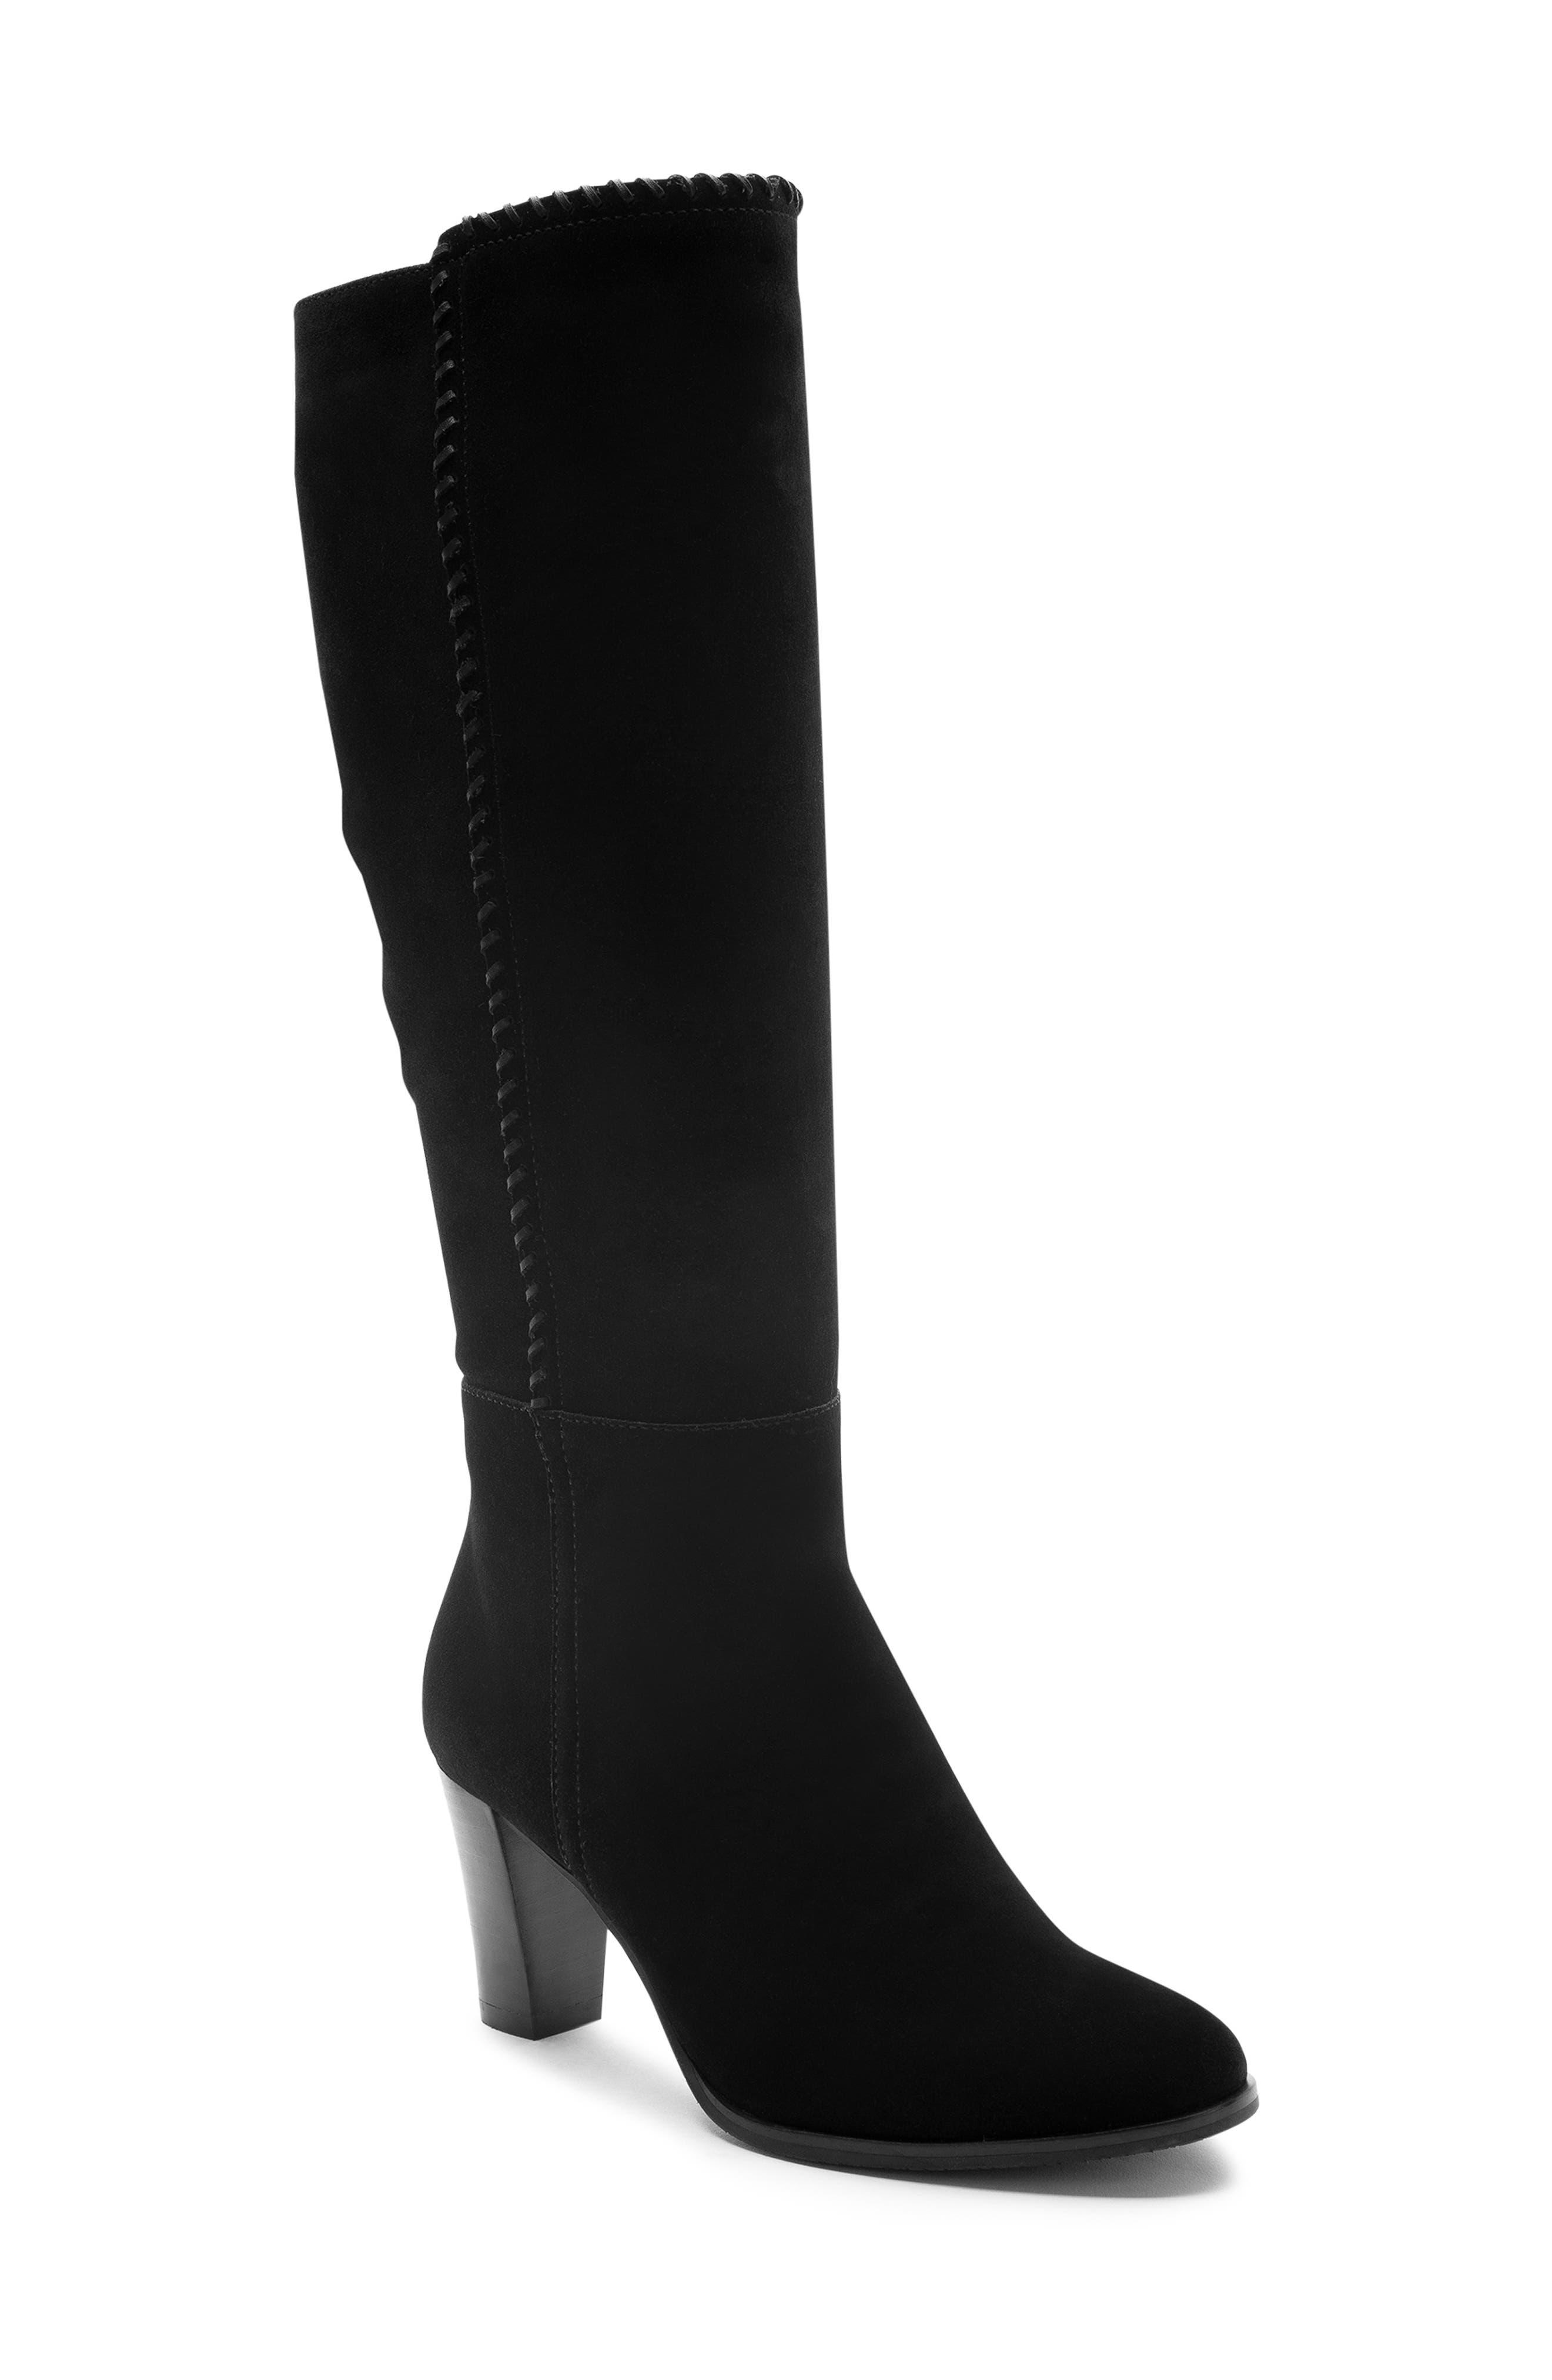 Edith Knee-High Waterproof Suede Boot,                             Main thumbnail 1, color,                             Black Suede